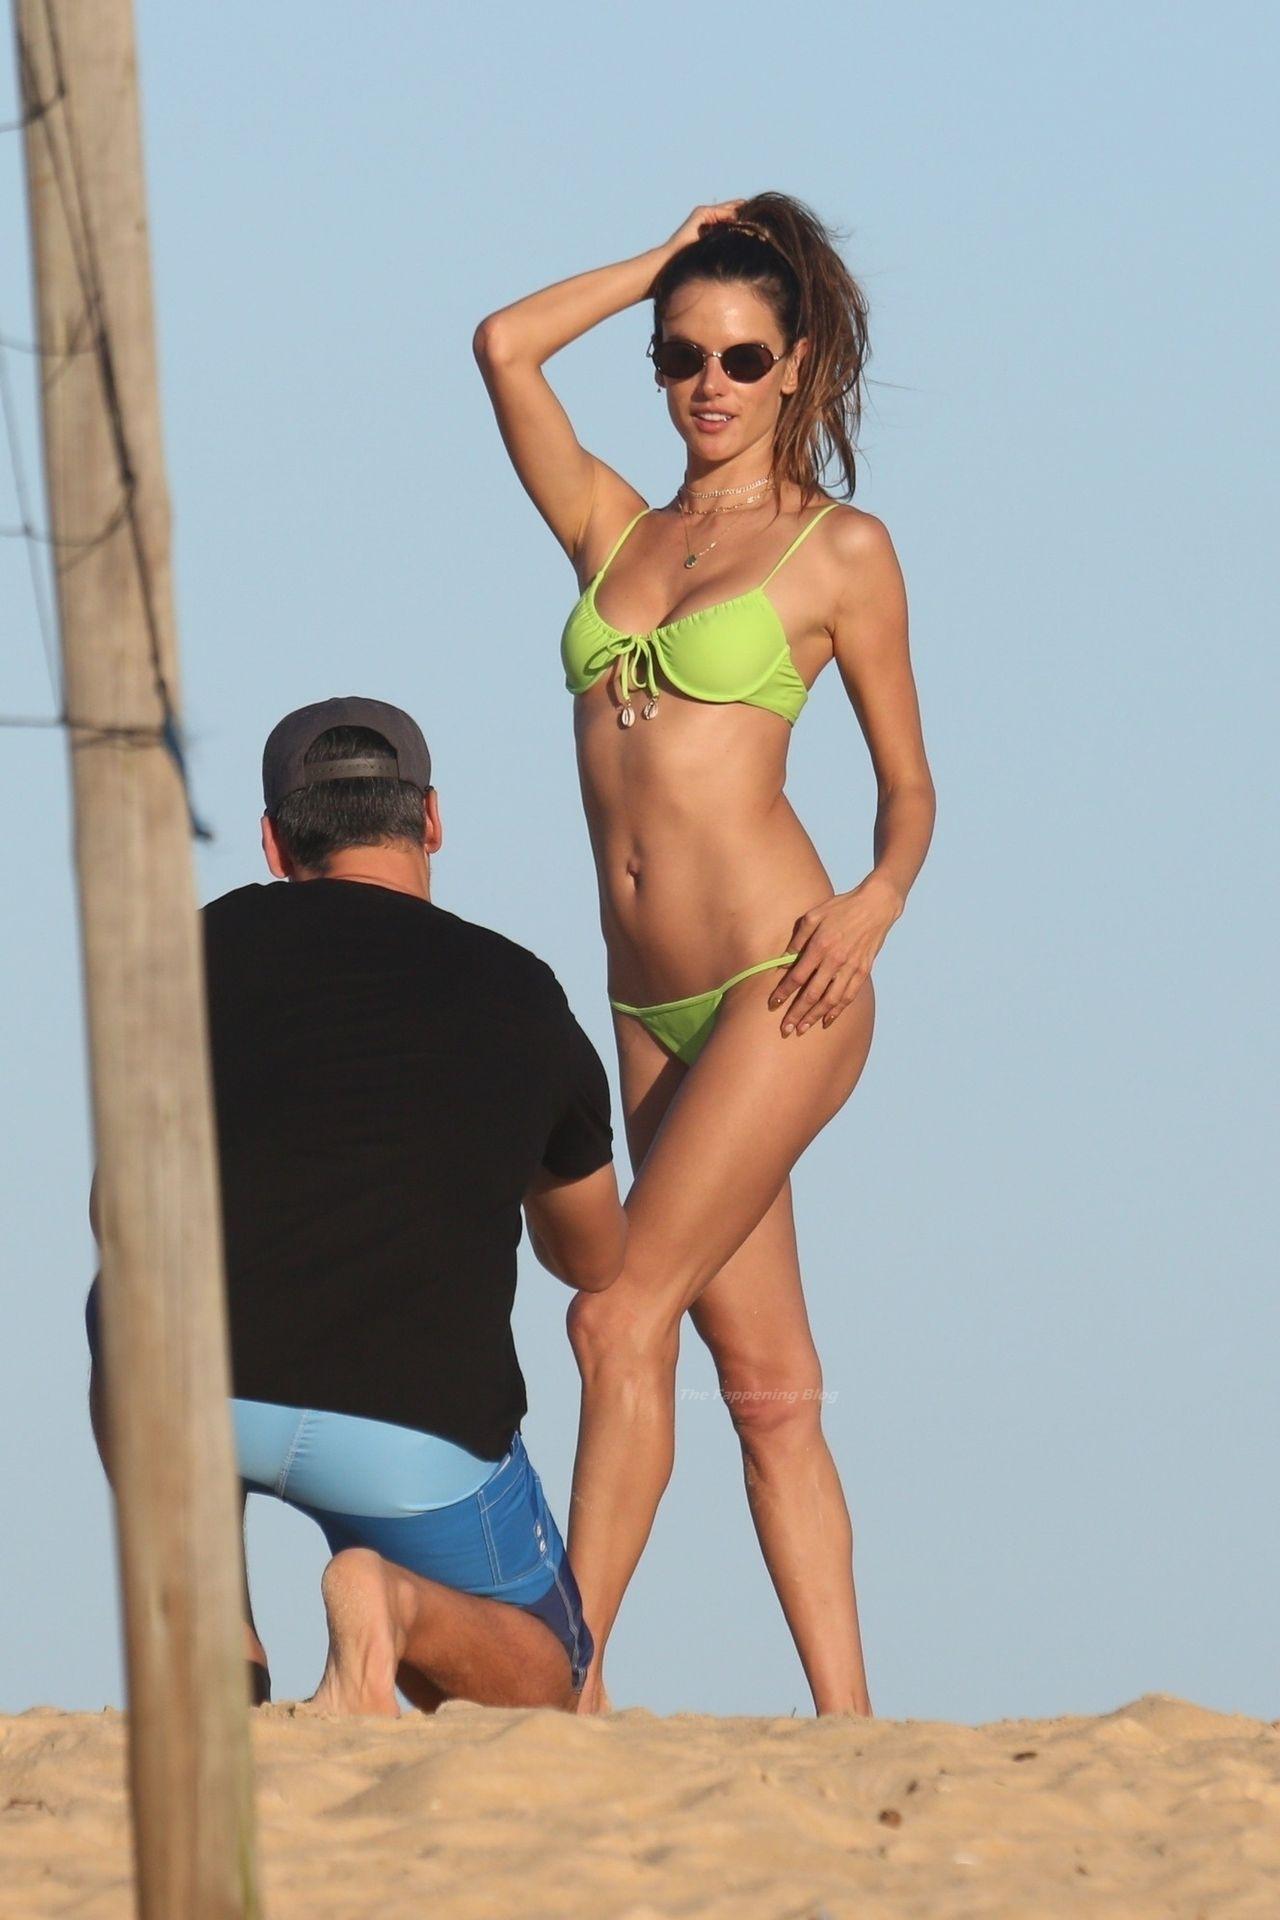 Alessandra-Ambrosio-Sexy-The-Fappening-Blog-781.jpg